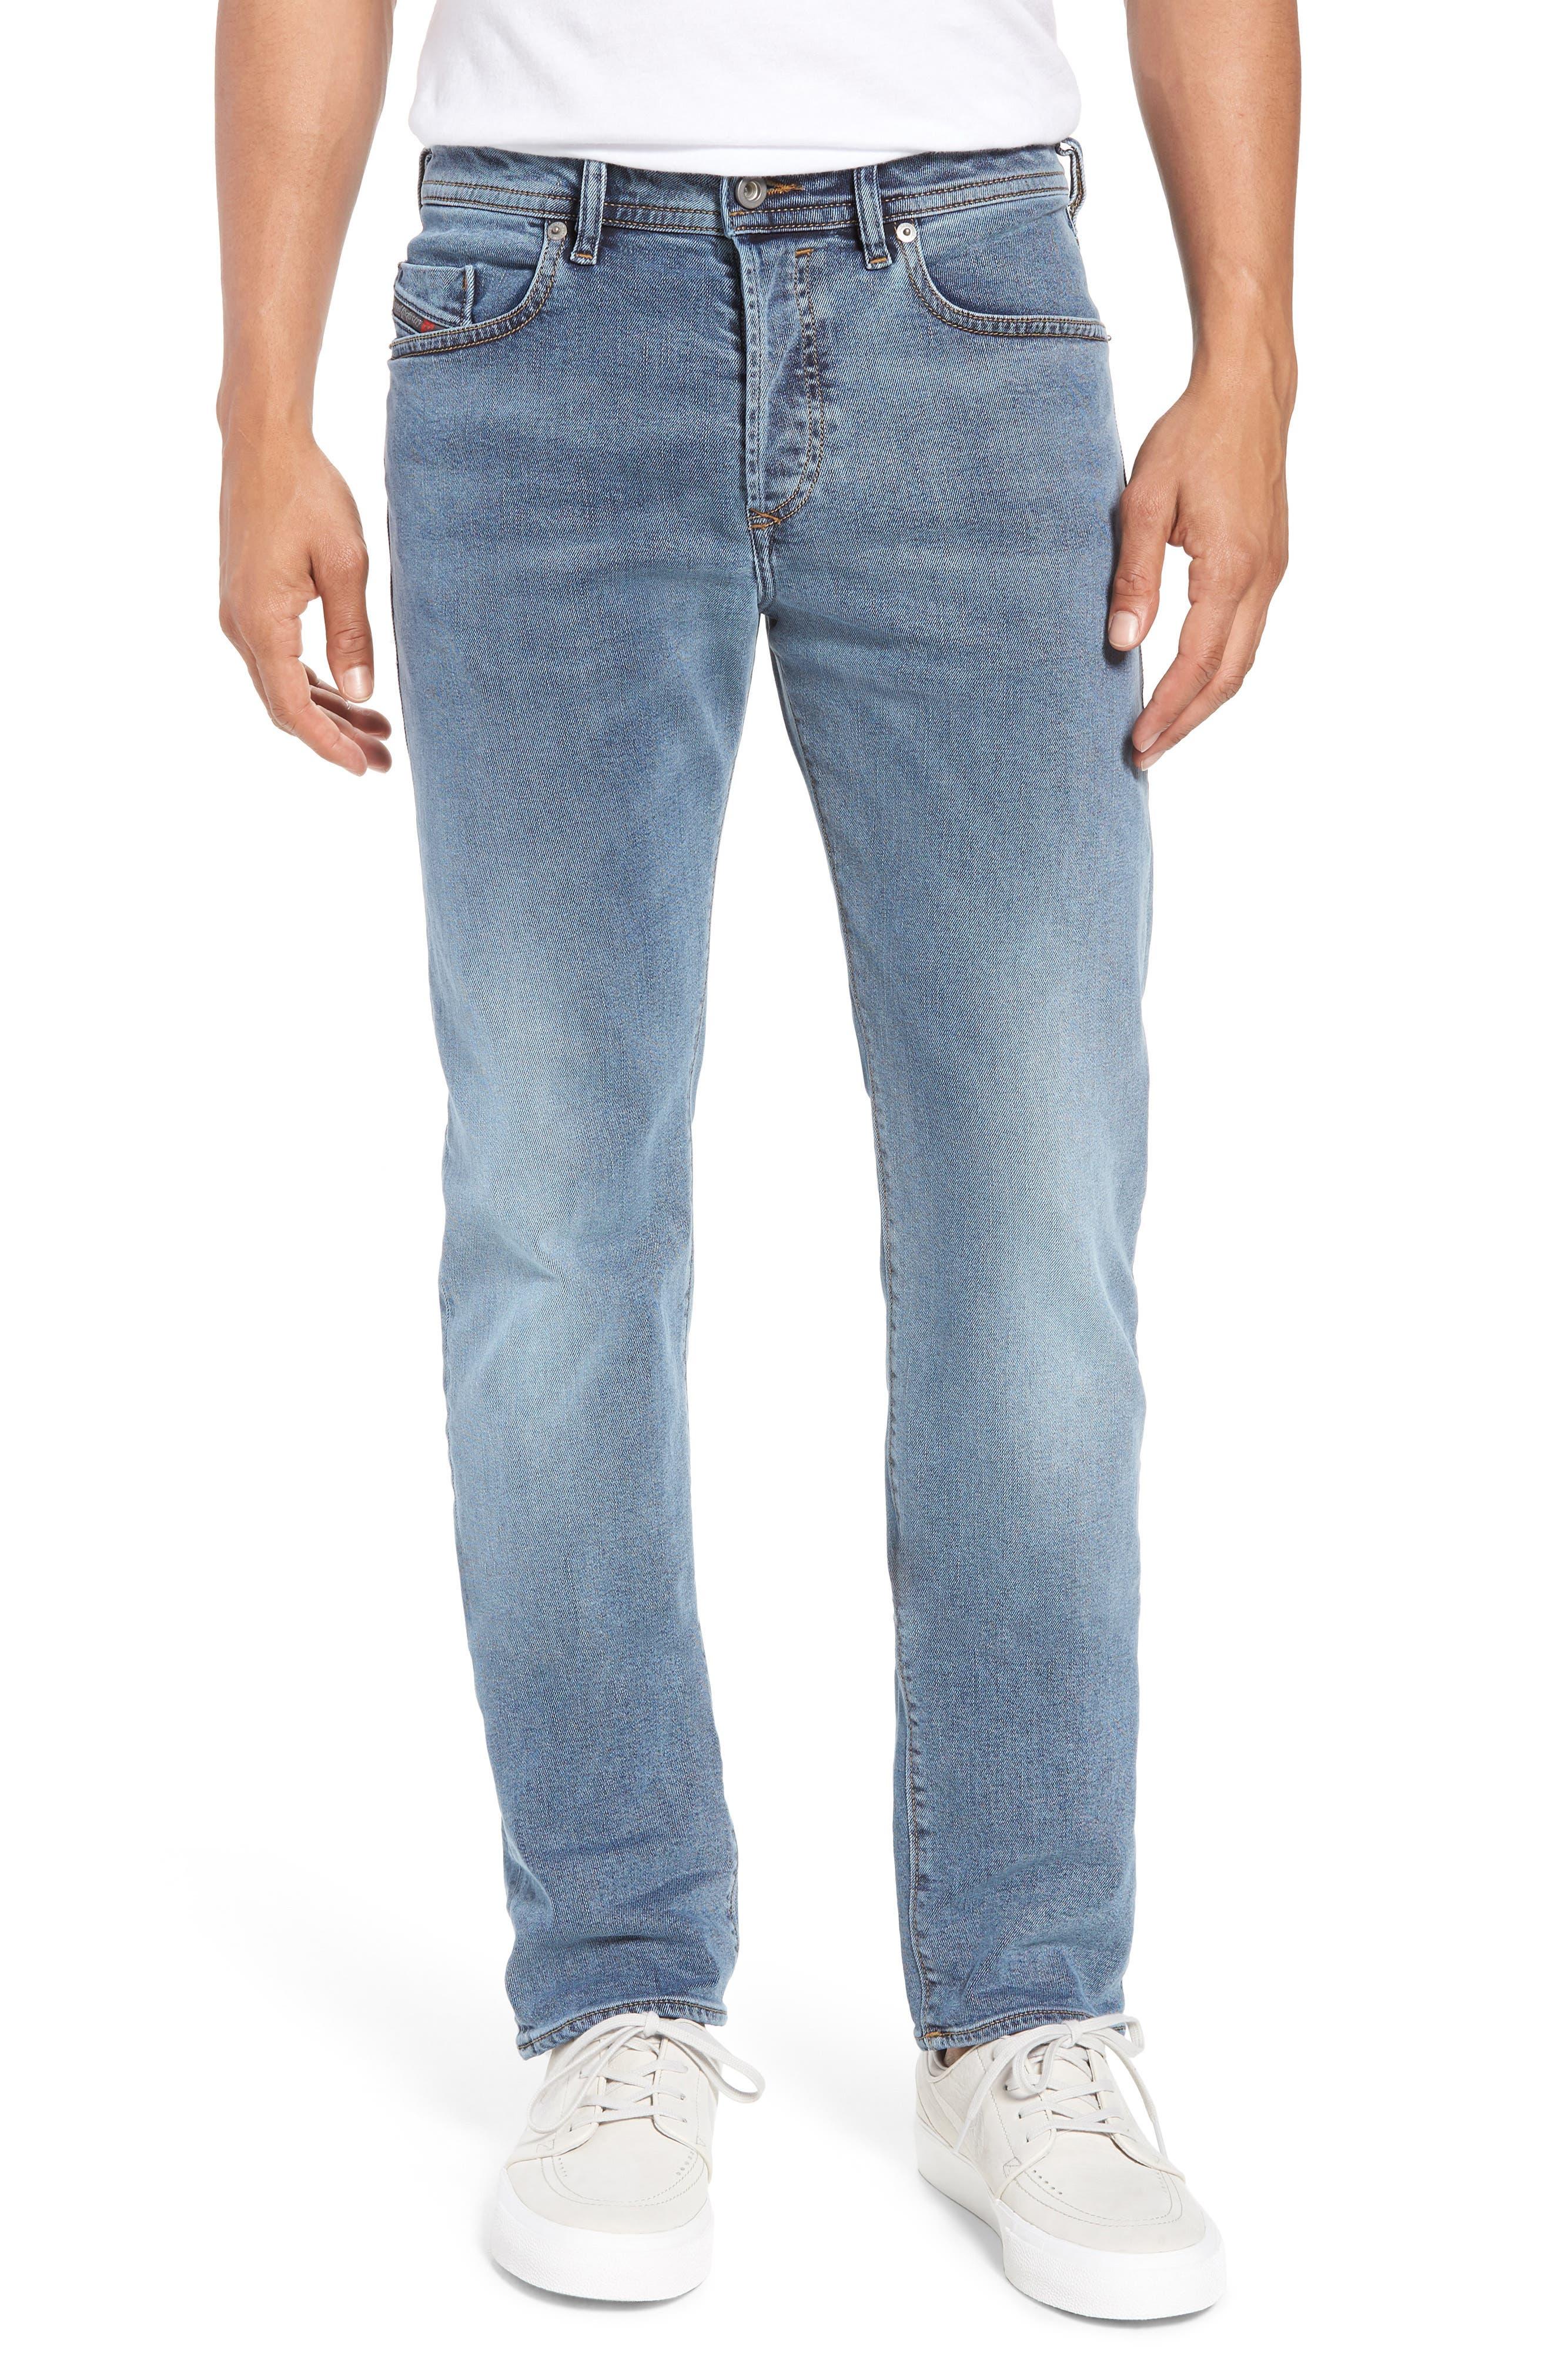 Buster Slim Straight Leg Jeans,                             Main thumbnail 1, color,                             084SJ